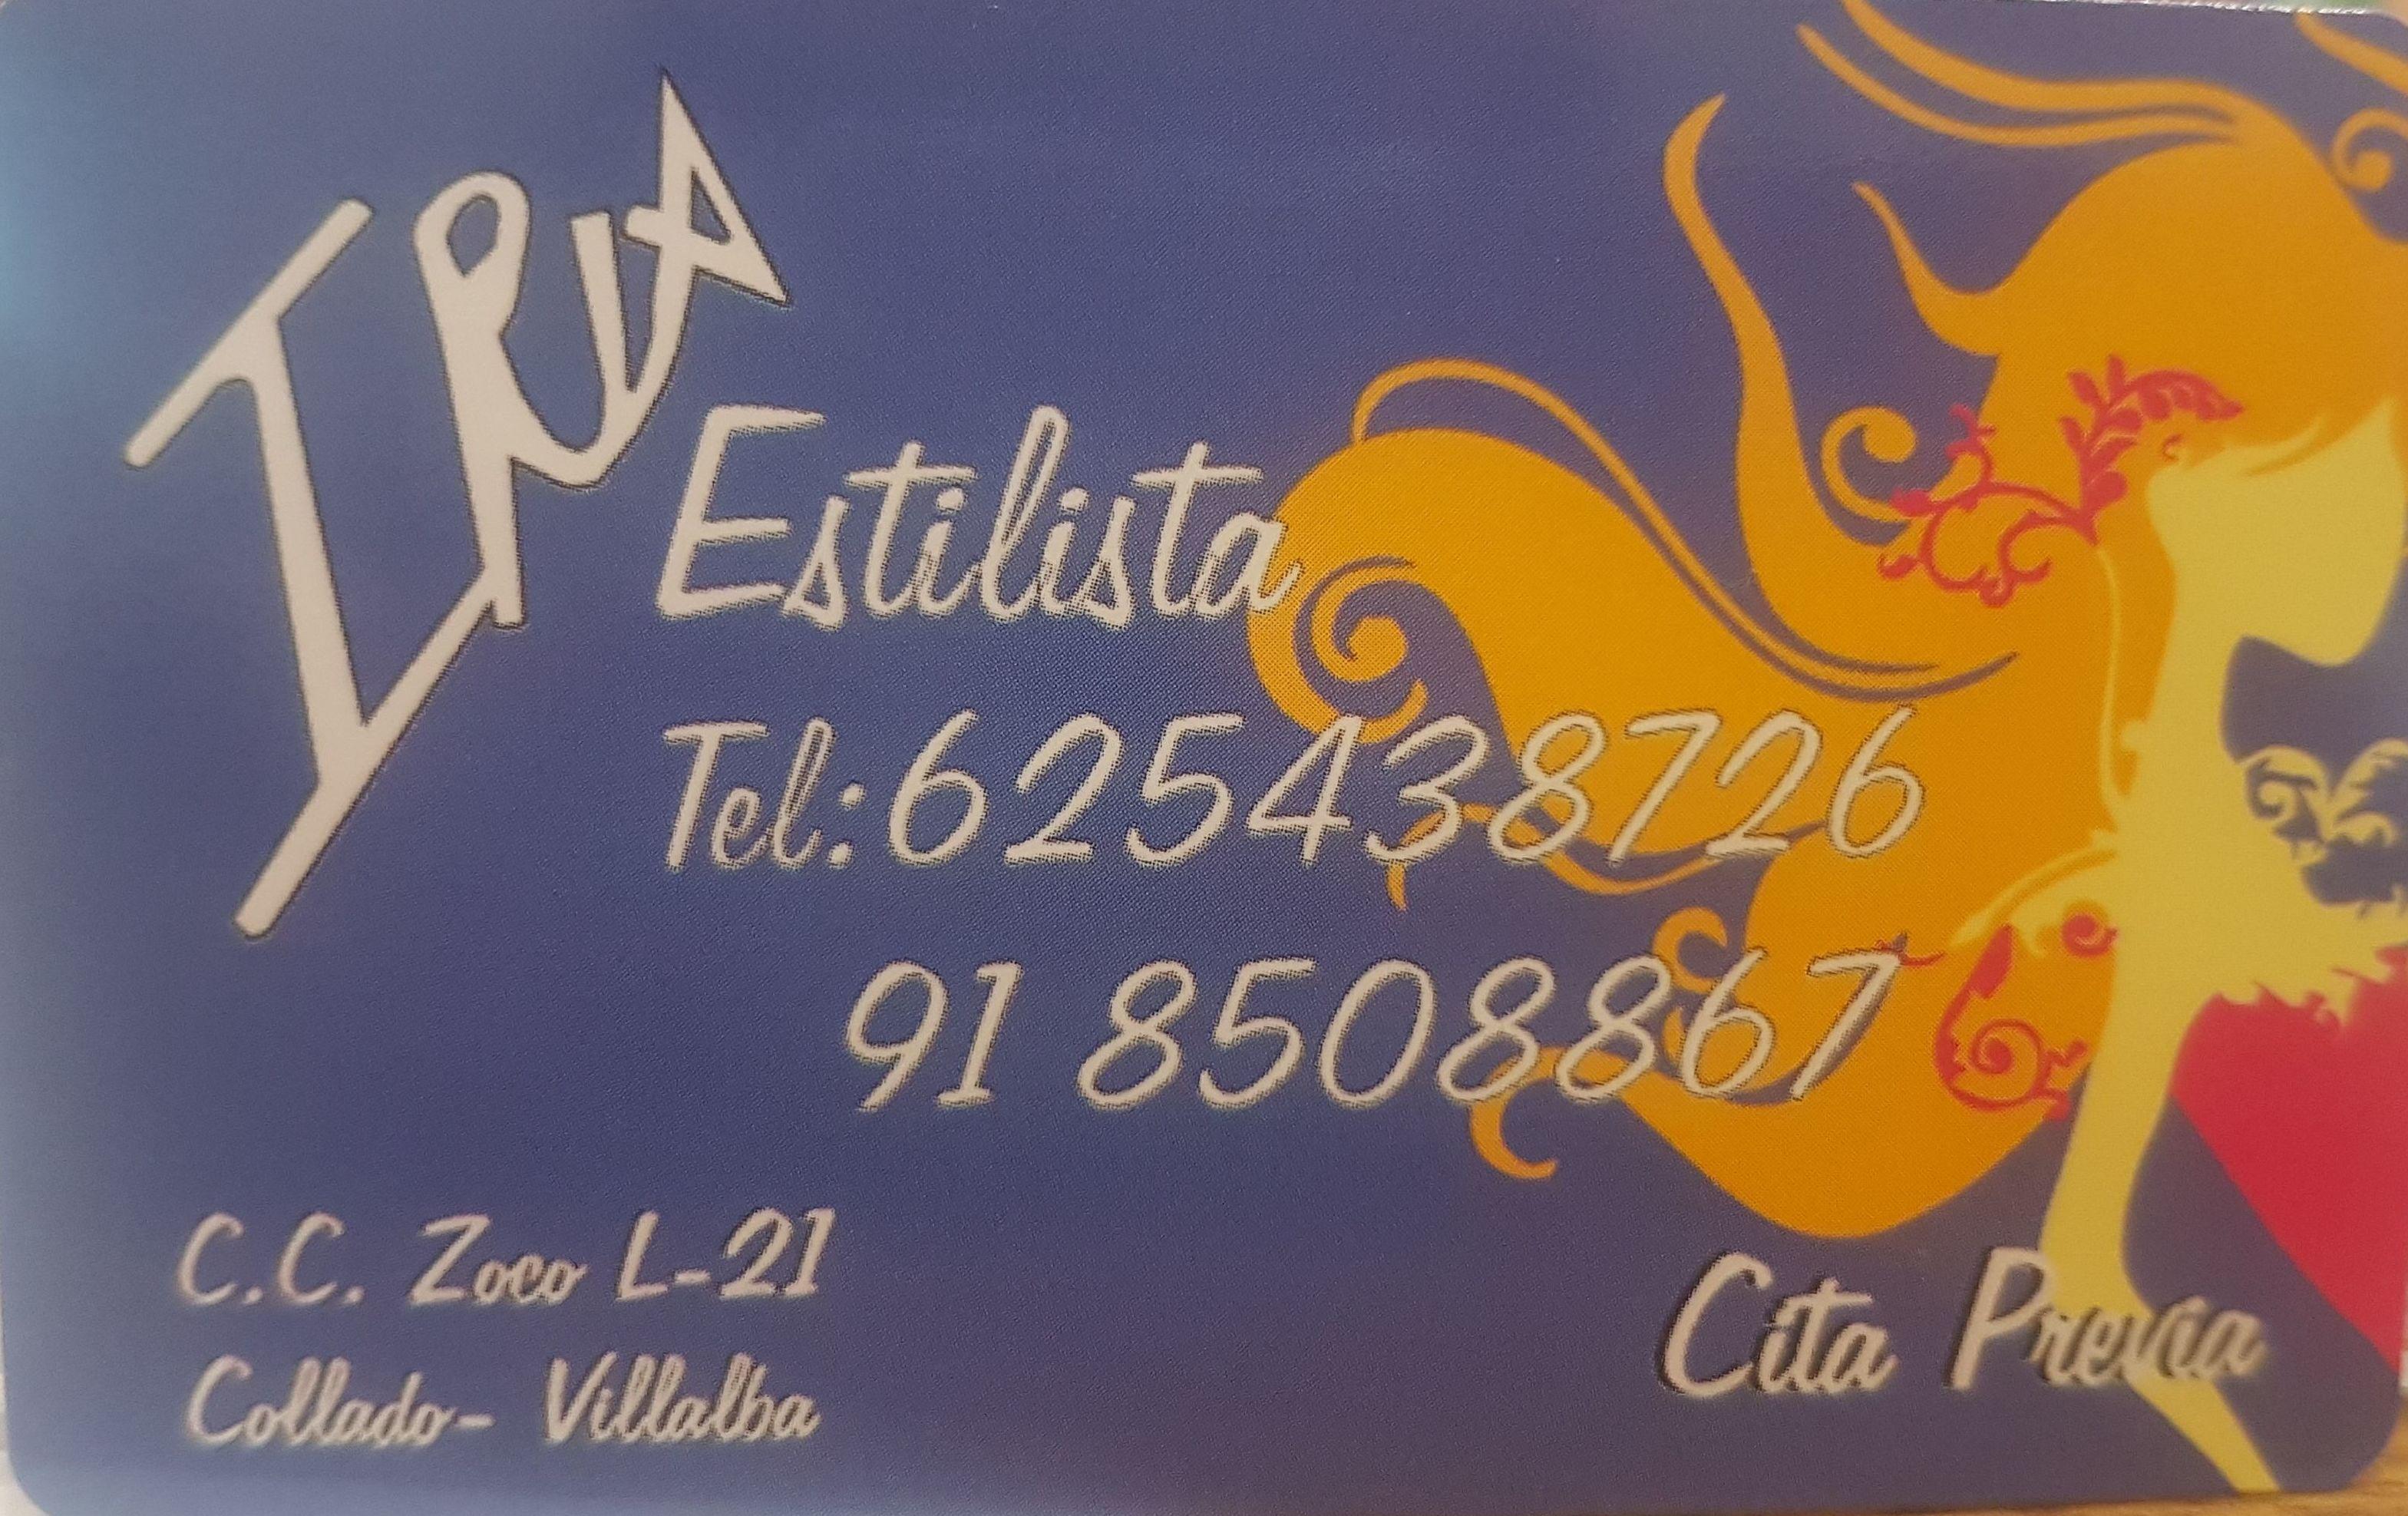 Iria Estilista. CC Zoco Villalba